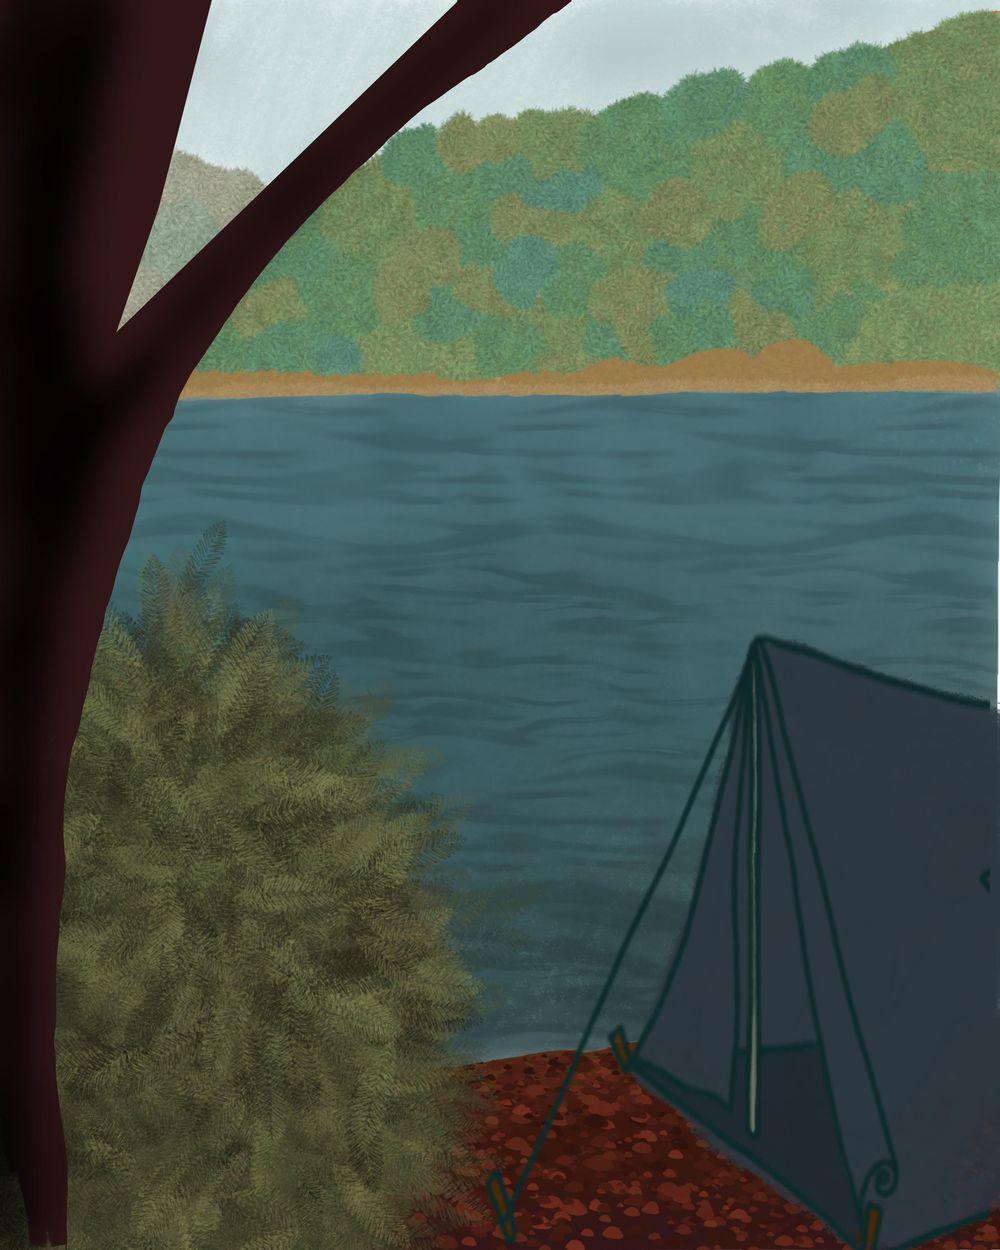 Camp scene - image 1 - student project